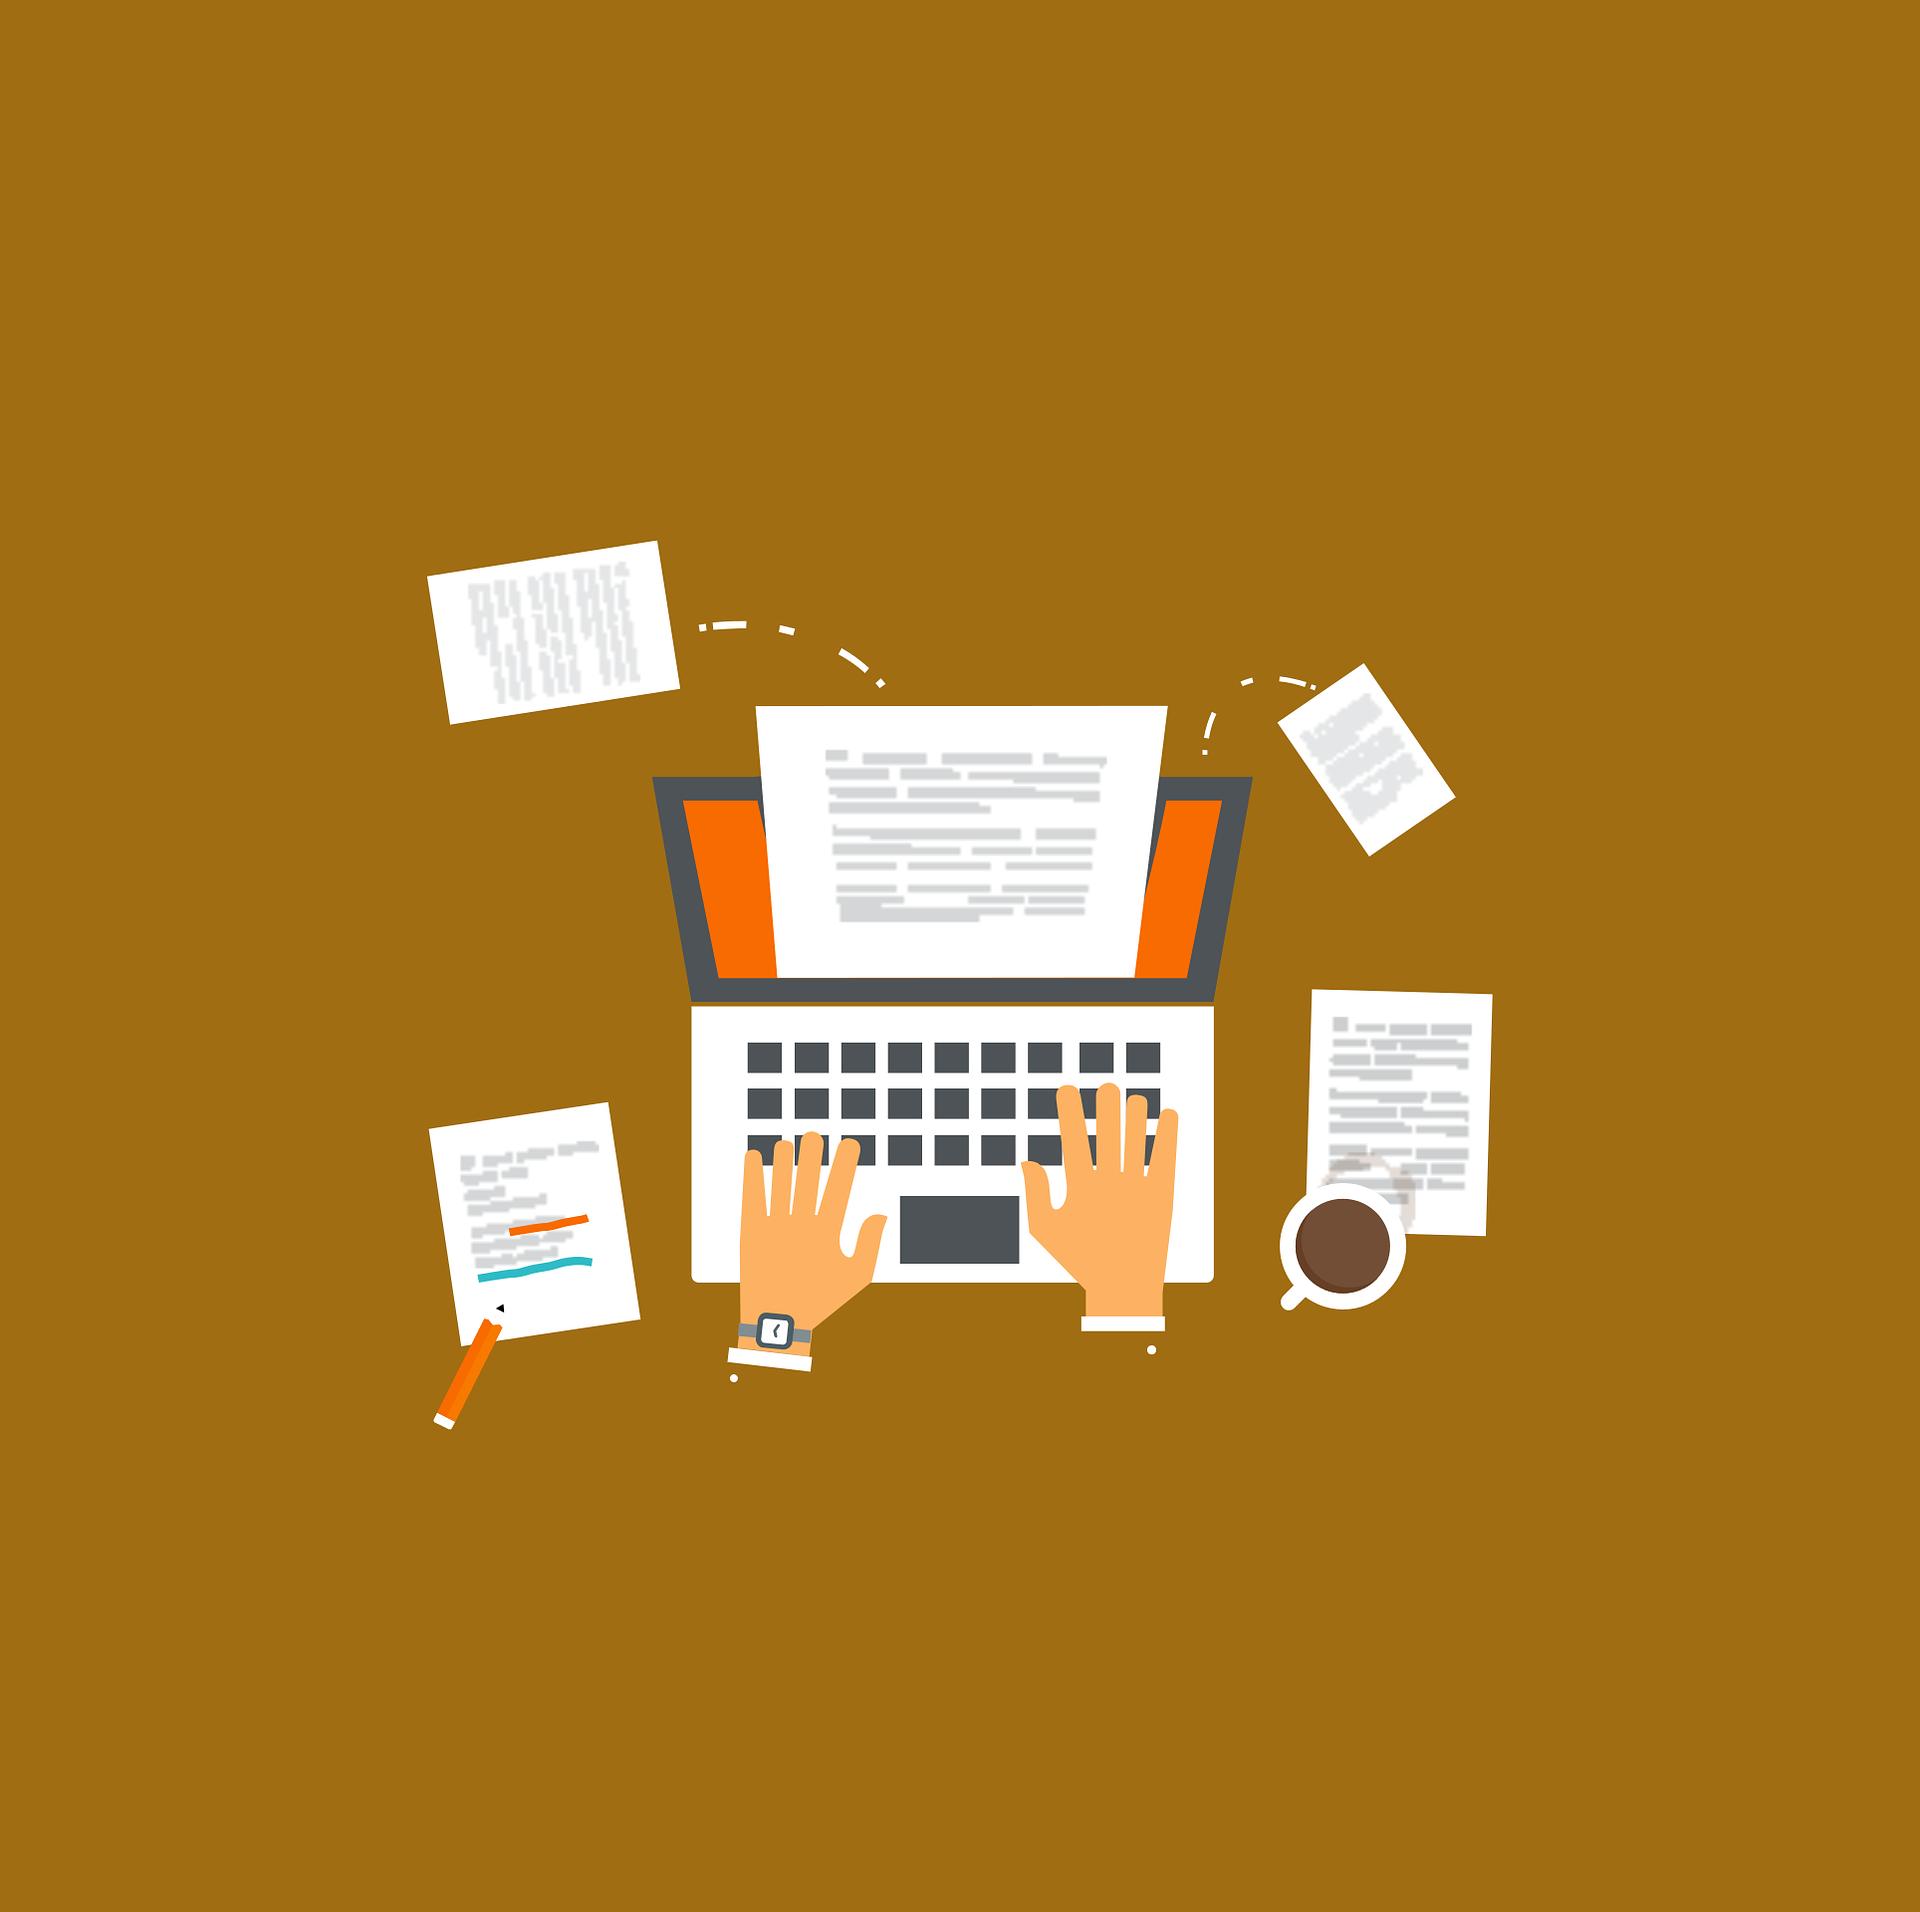 Best ways to ace your next online job interview